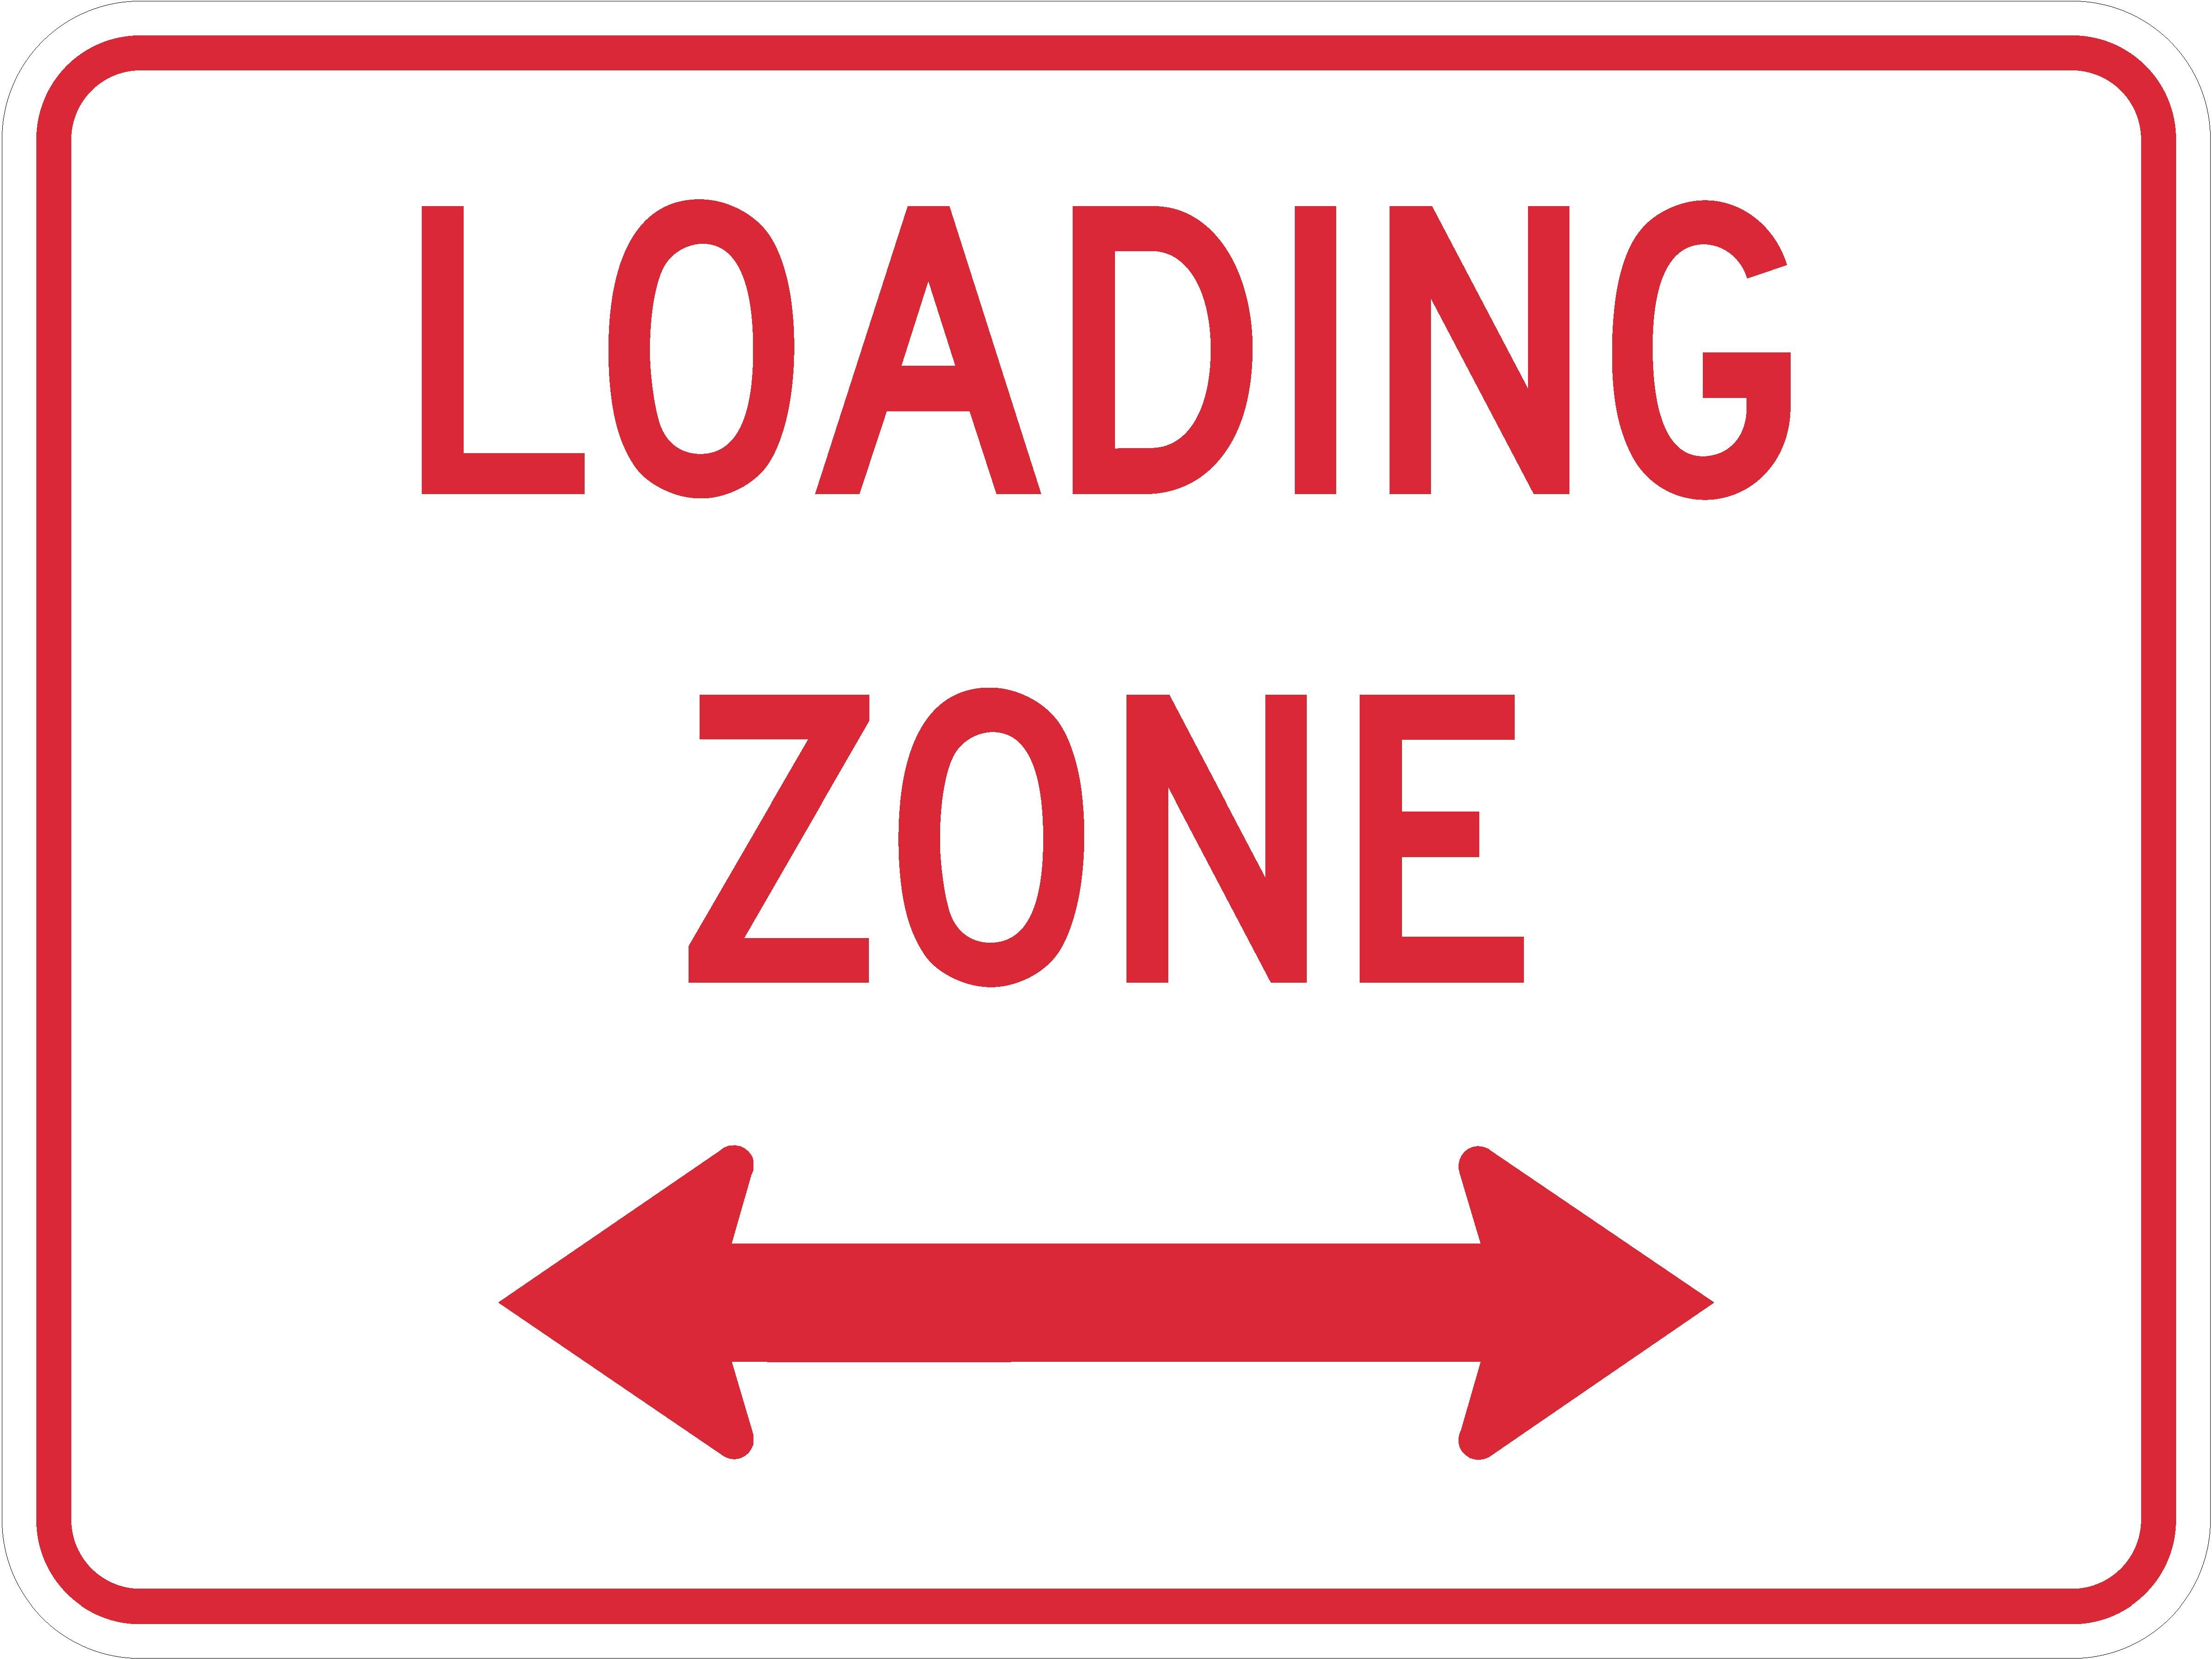 Loading Zone (plaque) R8-3gP